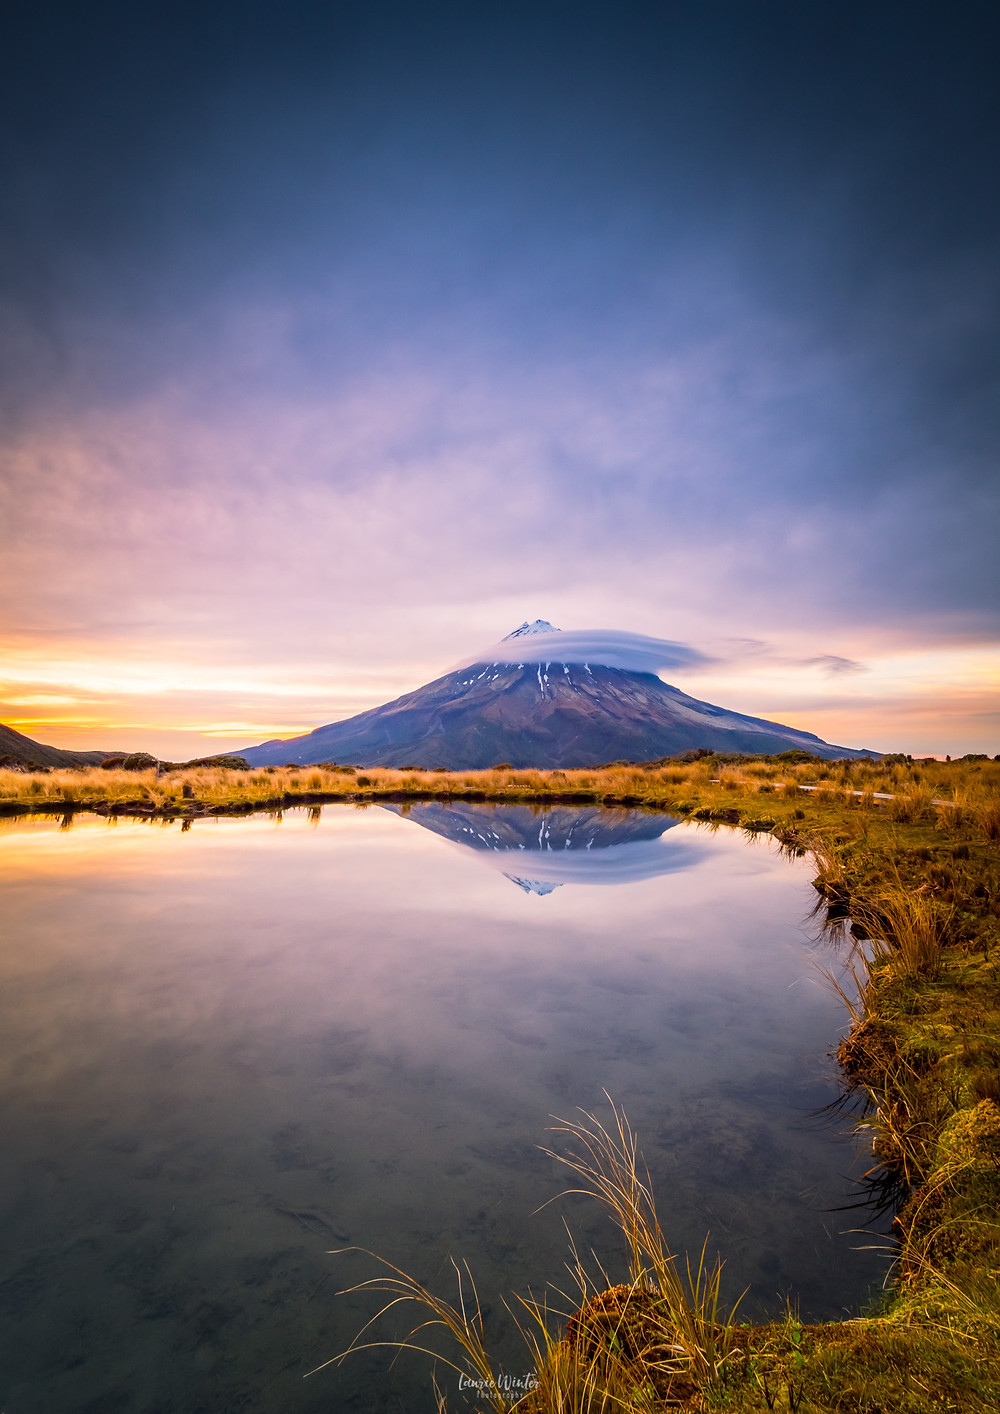 Sunrise with Mt Taranaki reflection in Pouakai Tarn beautiful